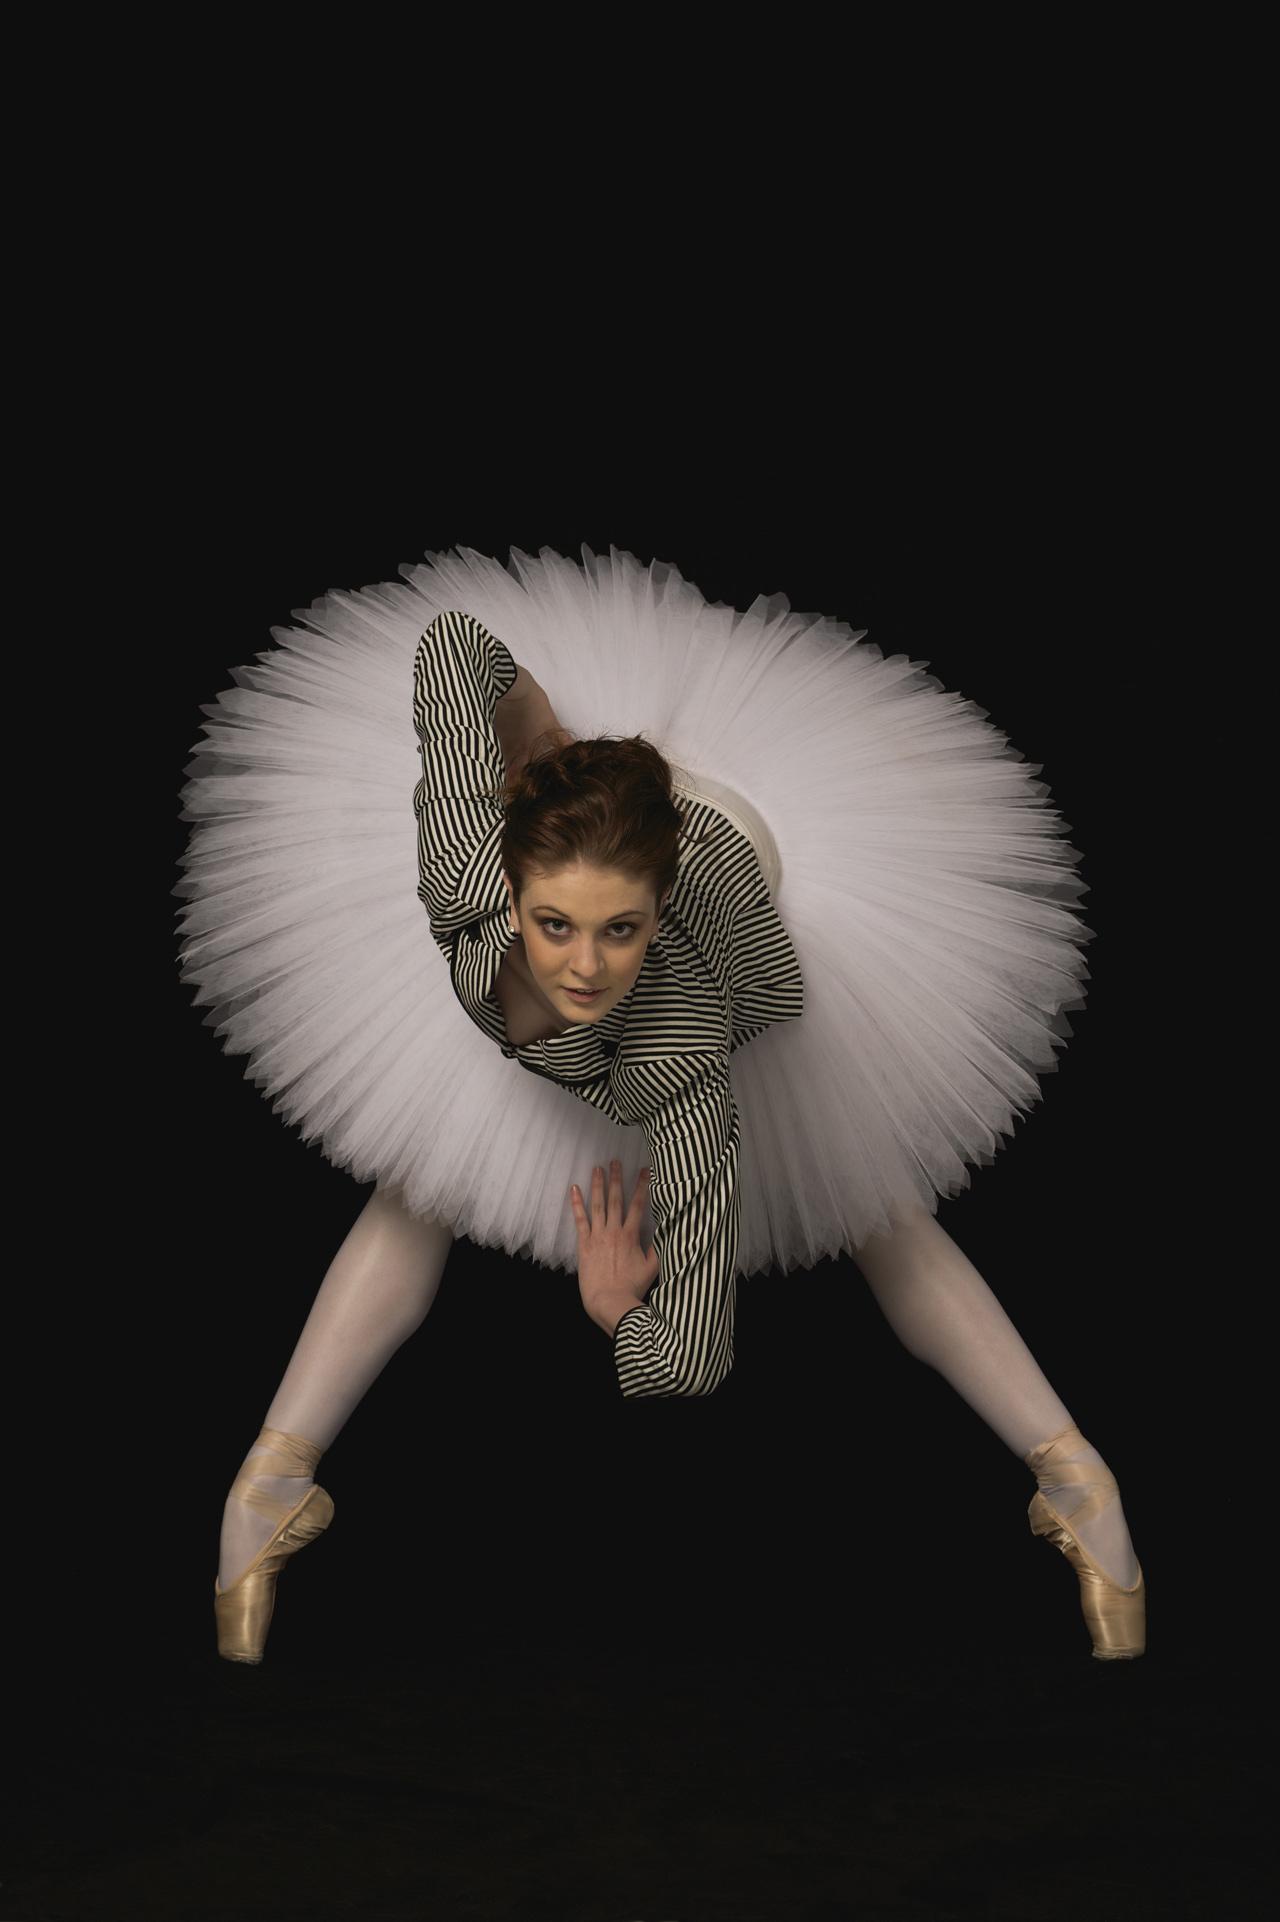 Dramatic Ballerina